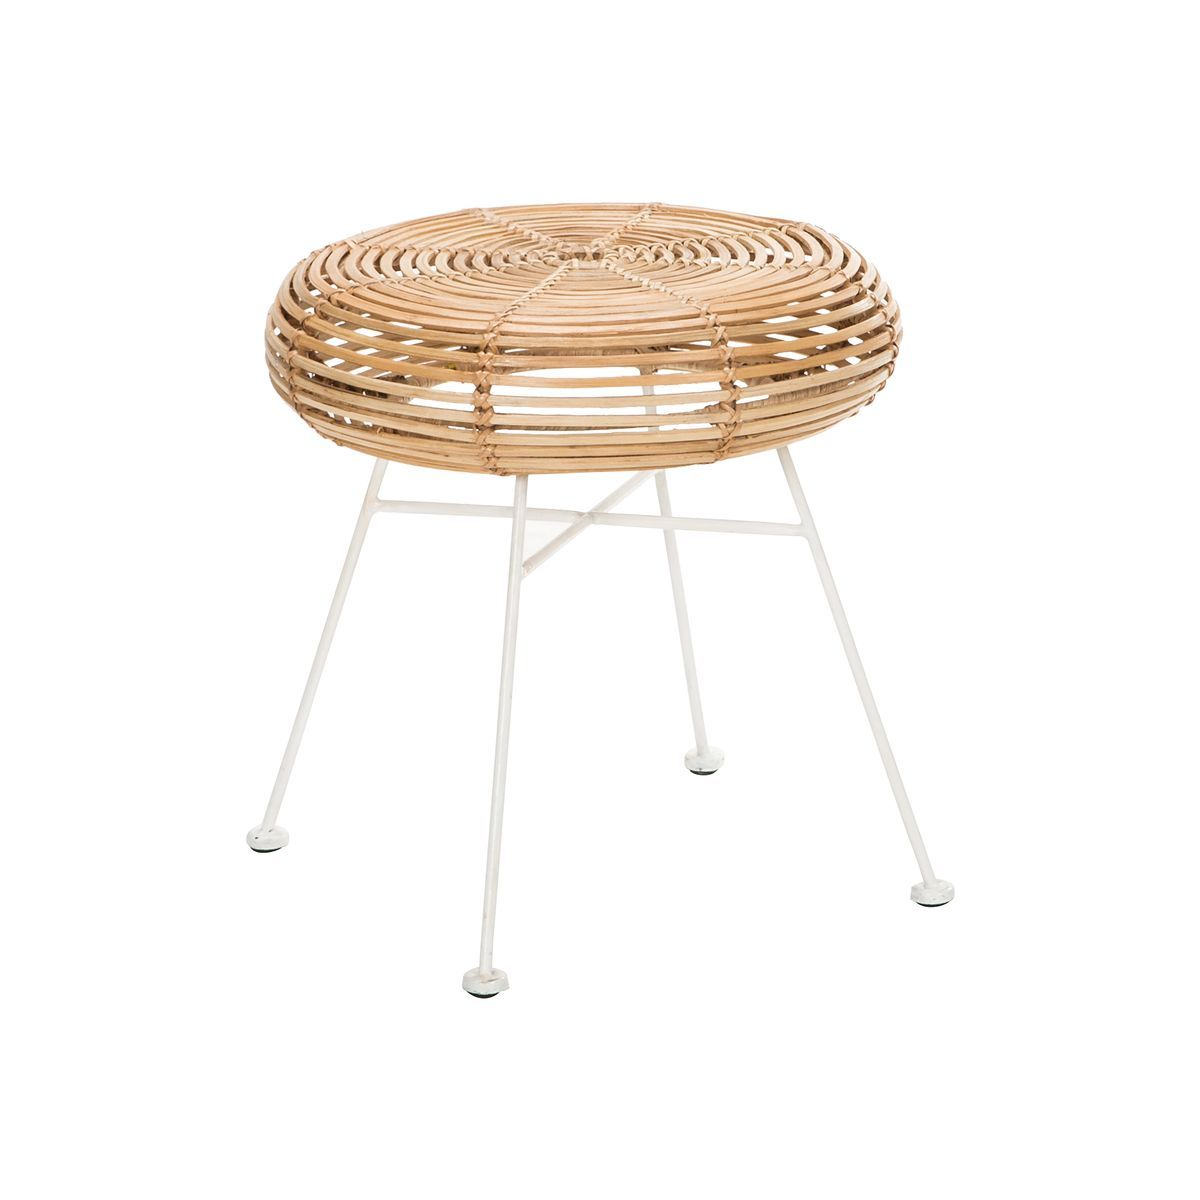 Table d'appoint en rotin pied en aluminium blanc